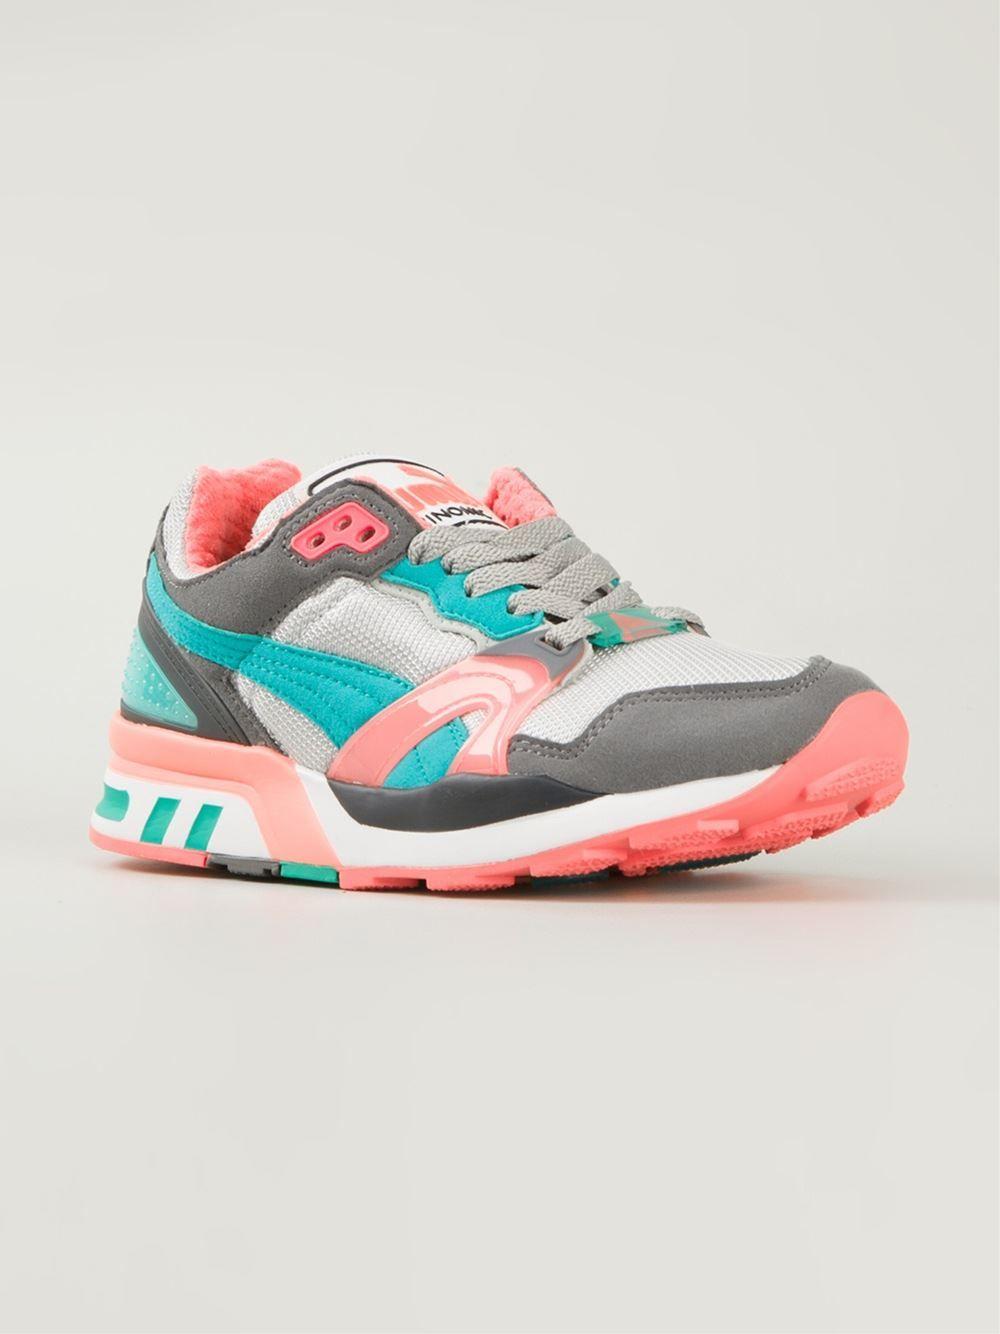 9f2c45299ebf95 Puma  trinomic  Sneakers - O  - Farfetch.com